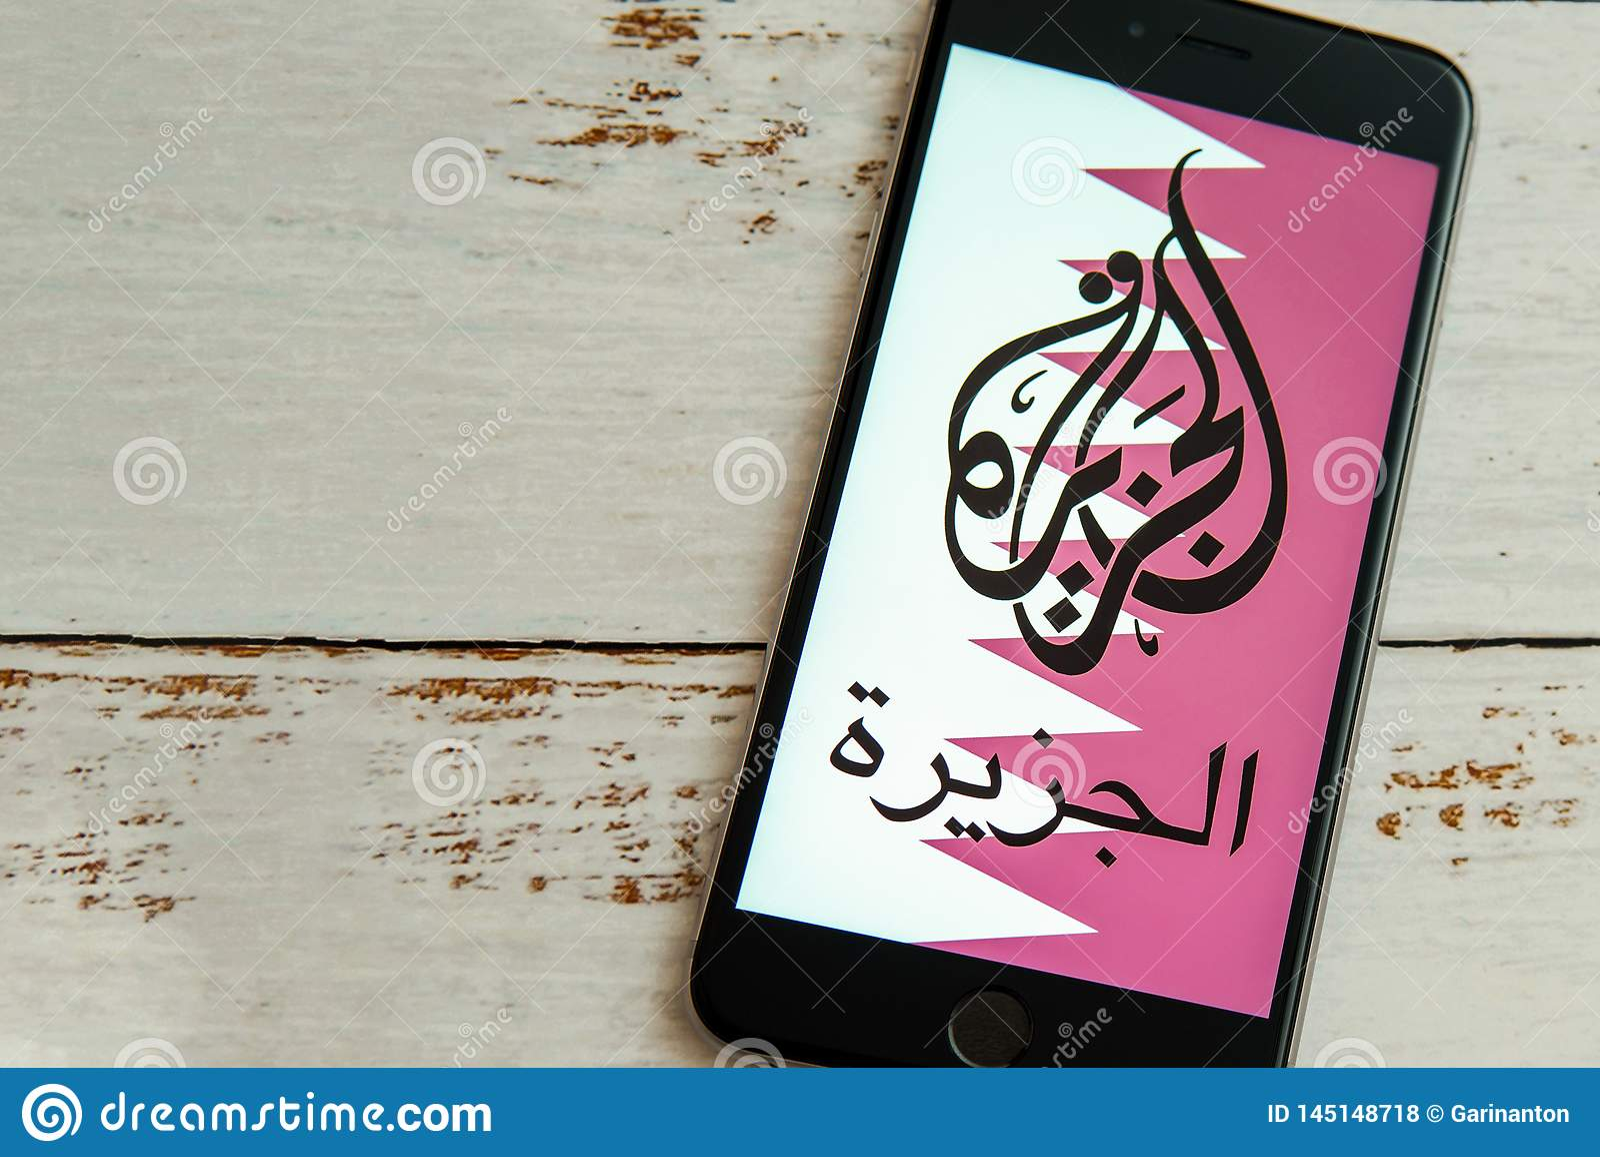 Black iPhone with logo of news media Al Jazeera on the screen.